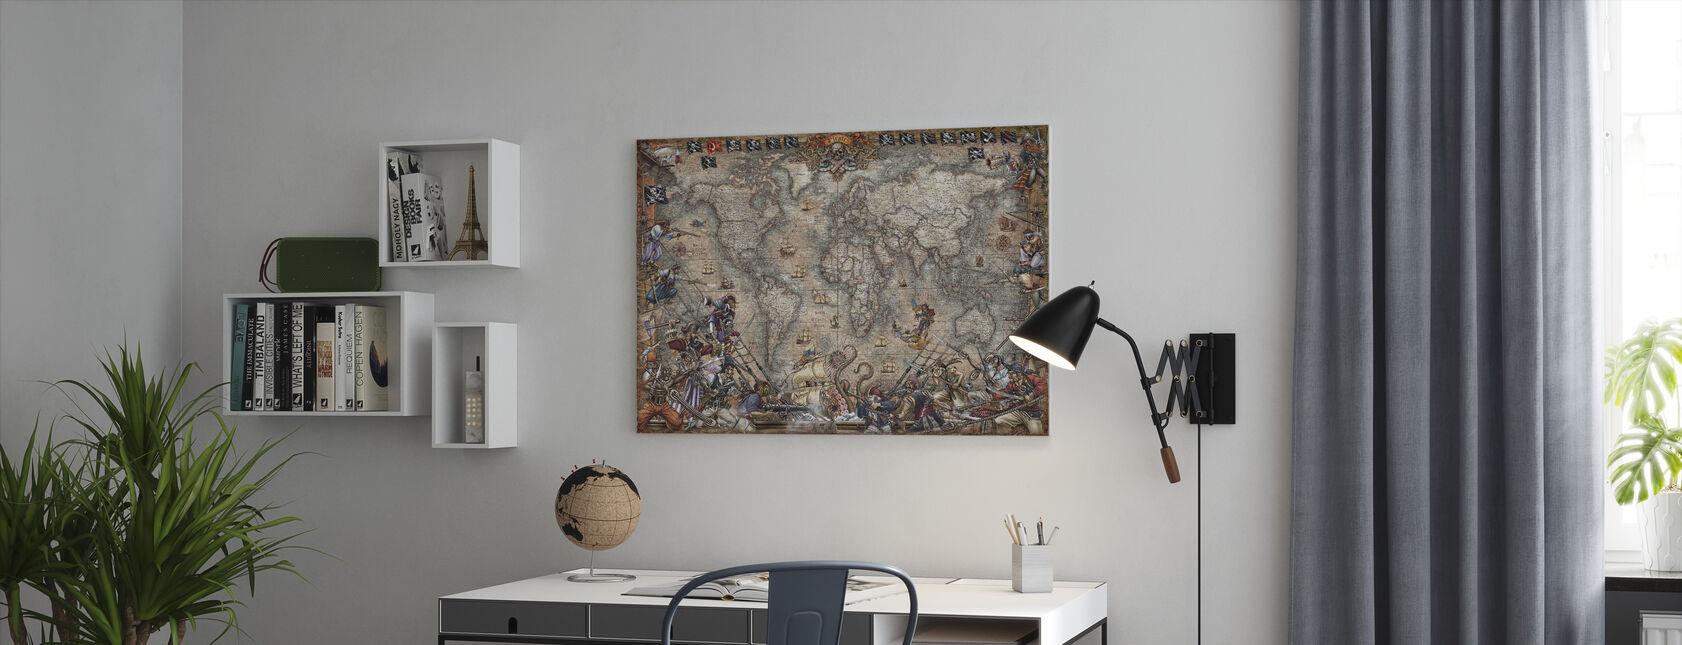 Pirates Map - Canvas print - Office